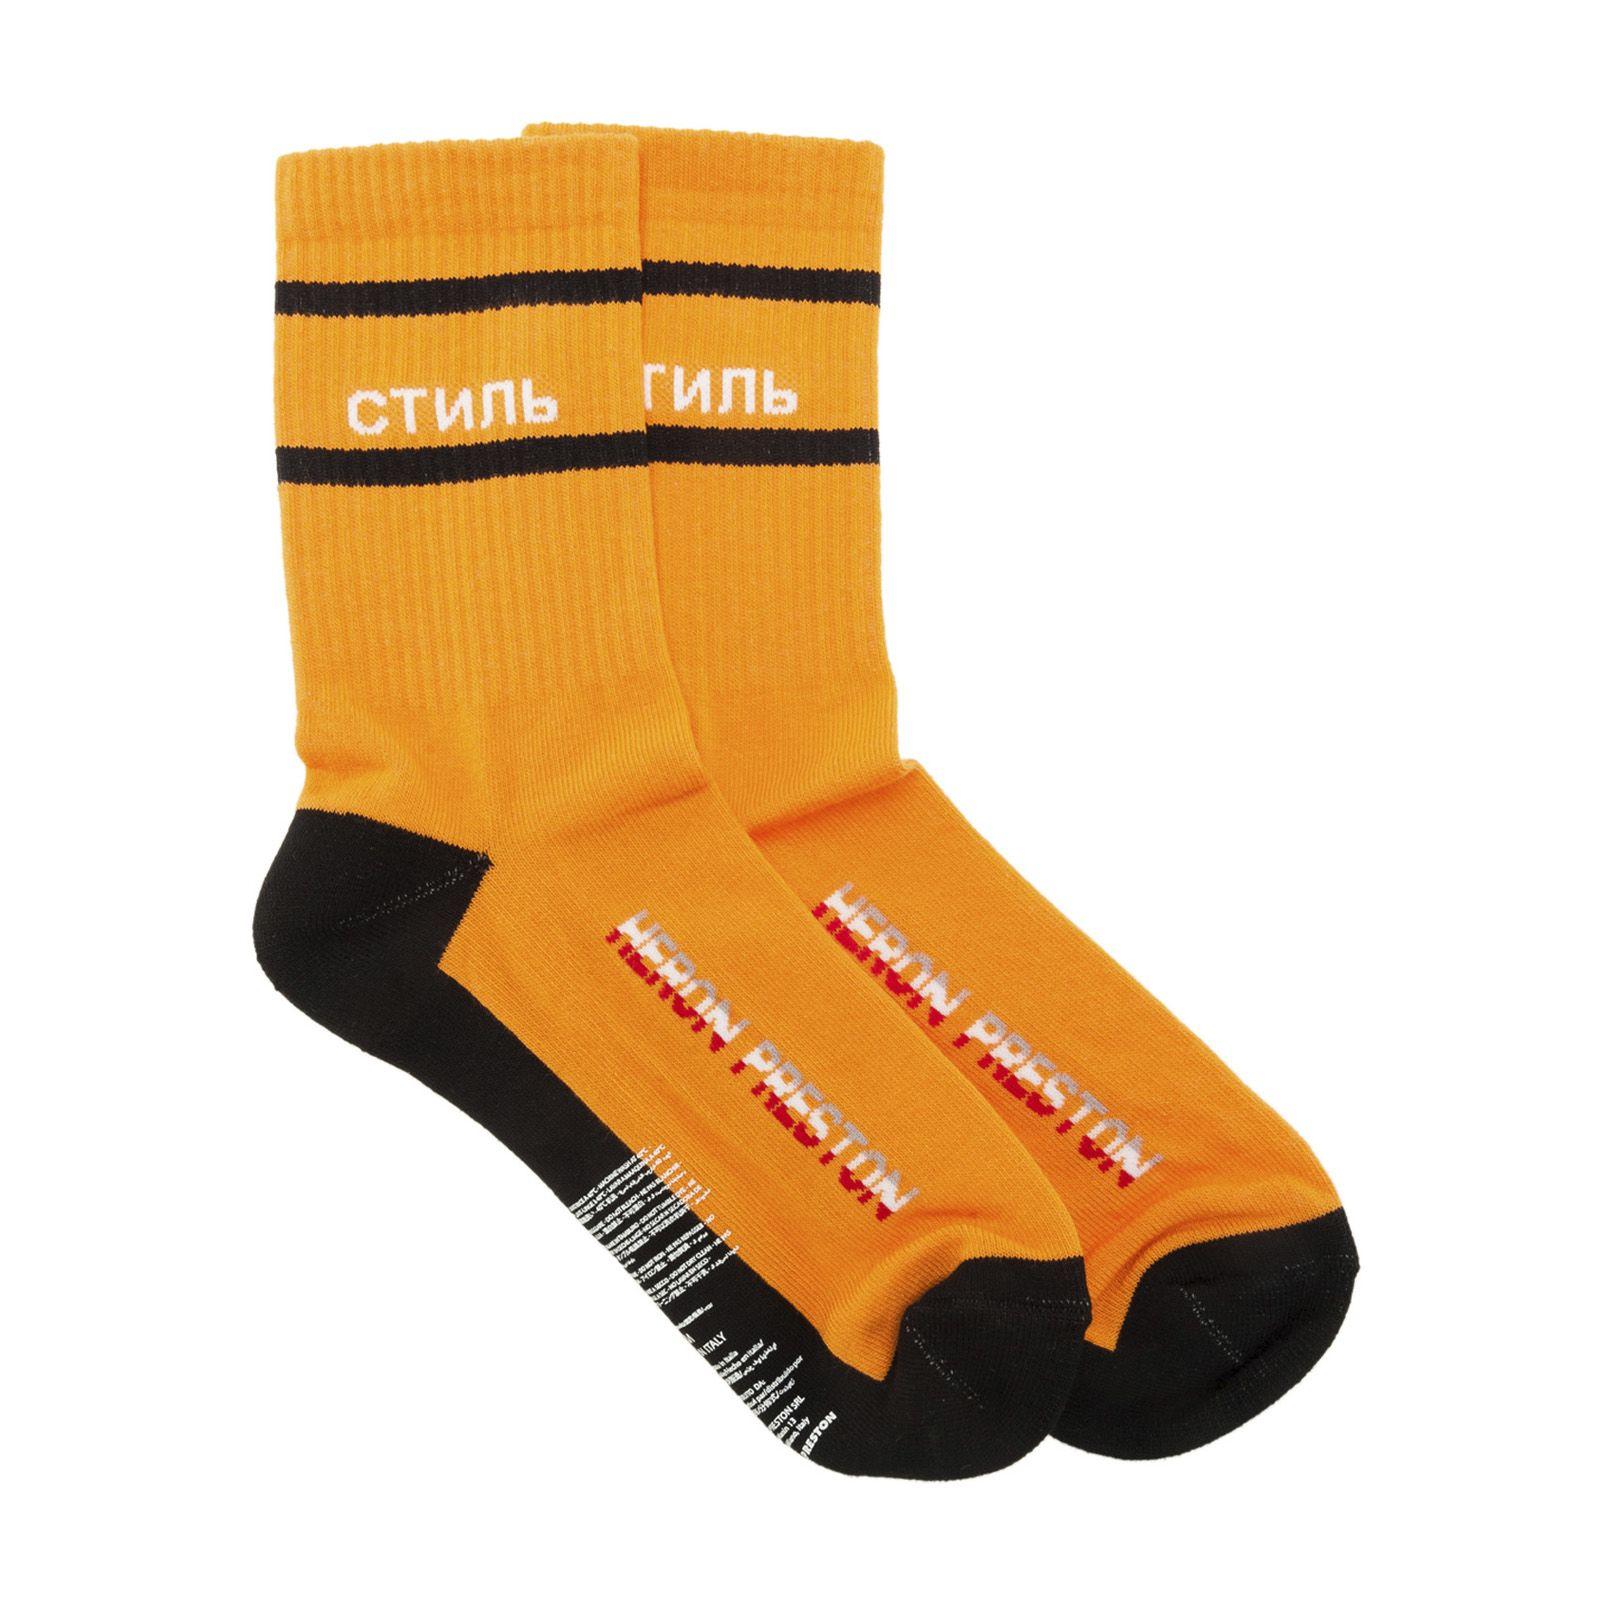 Heron Preston Style Socks